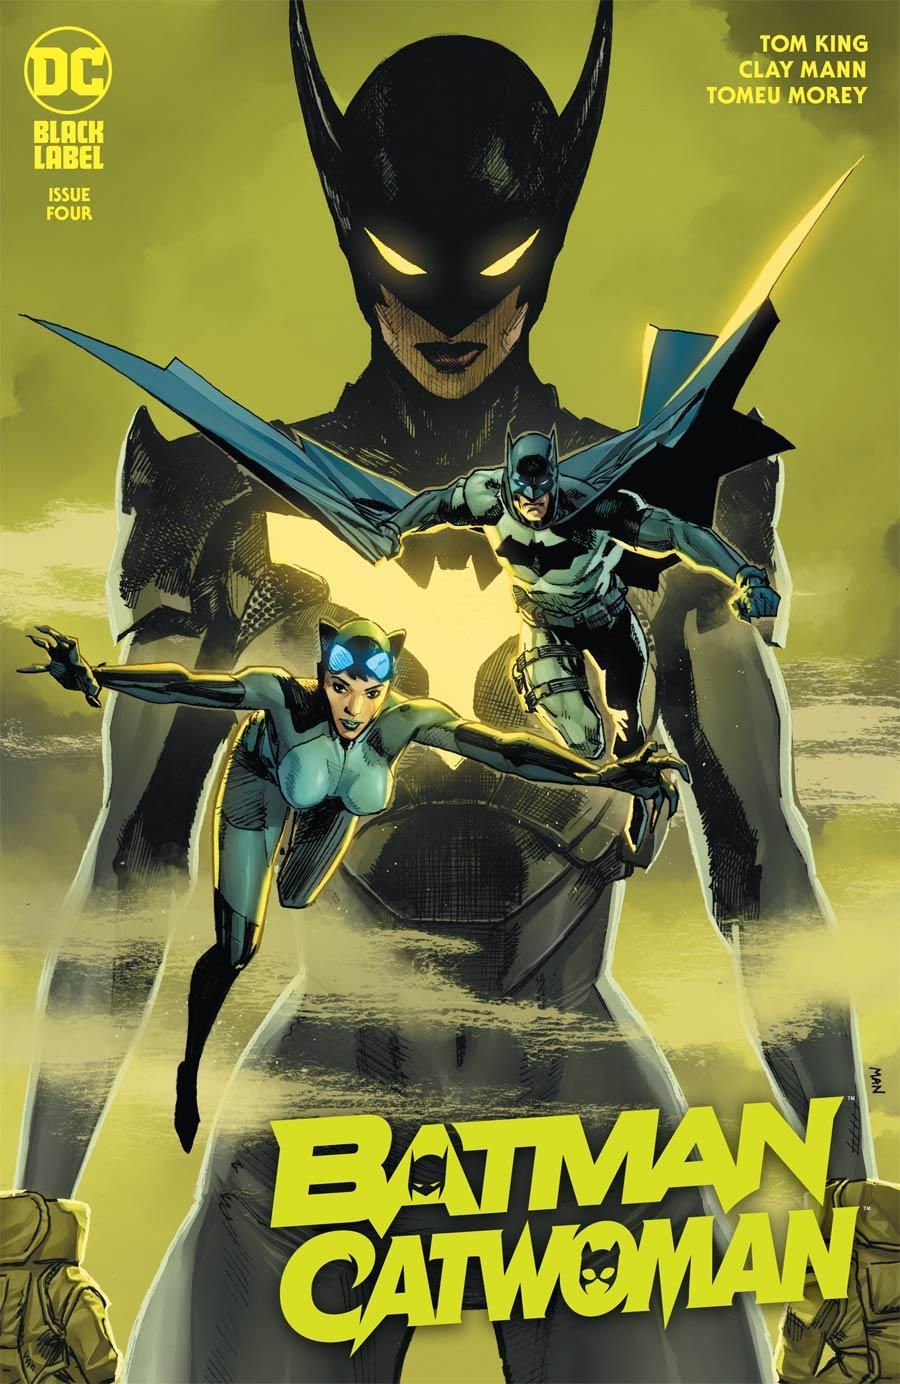 Batman Catwoman #4 Cover A Regular Clay Mann Cover